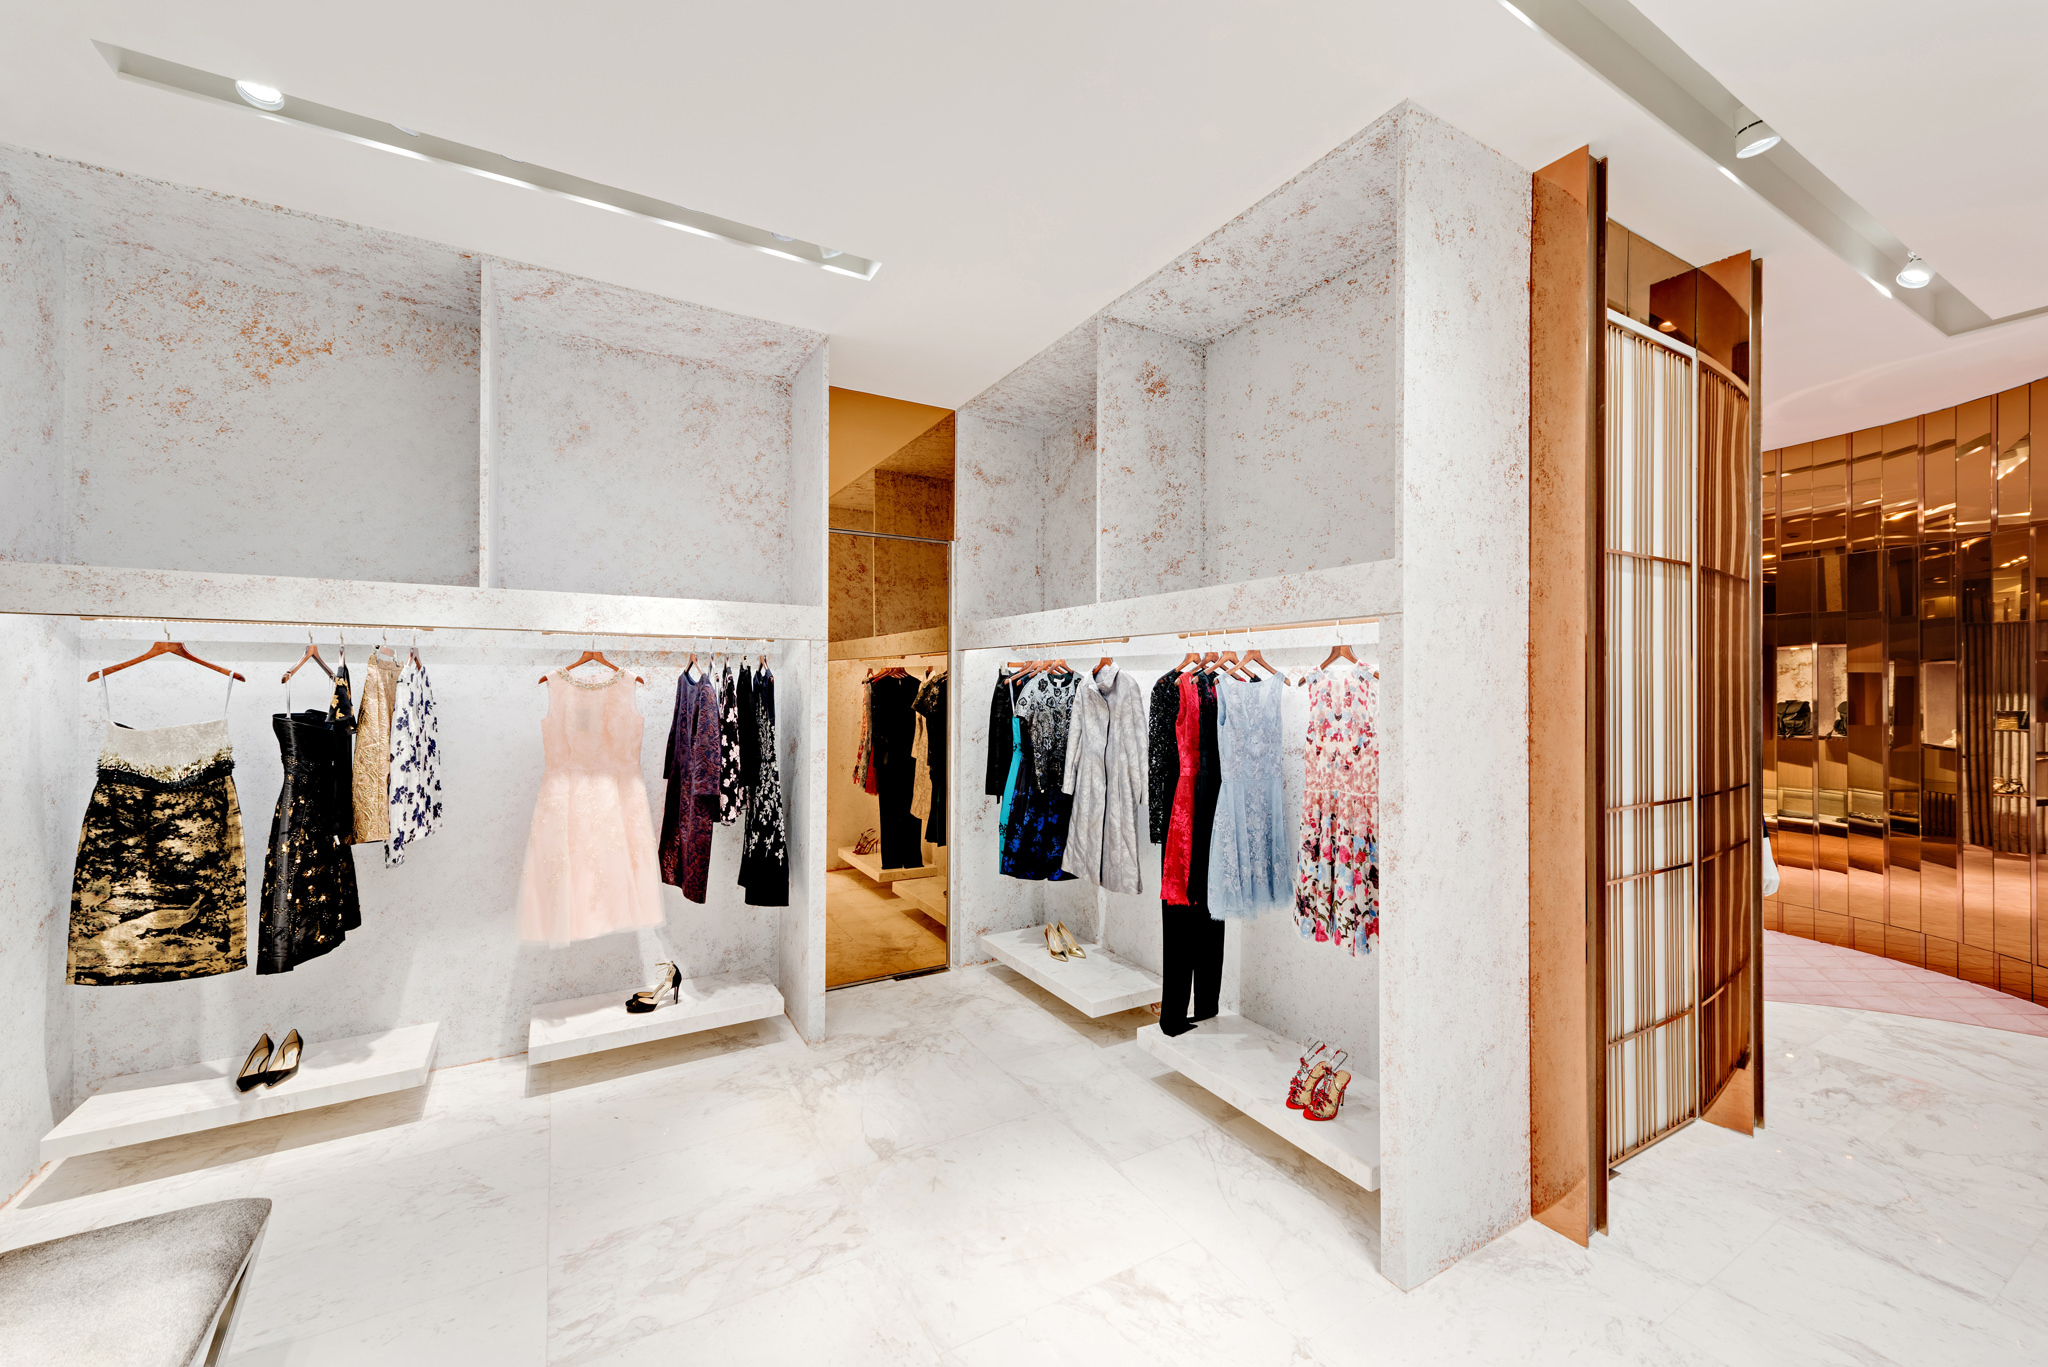 20161224 - Jacqueline - HCM - Commercial - Interior - Store - Retouch 0002.jpg